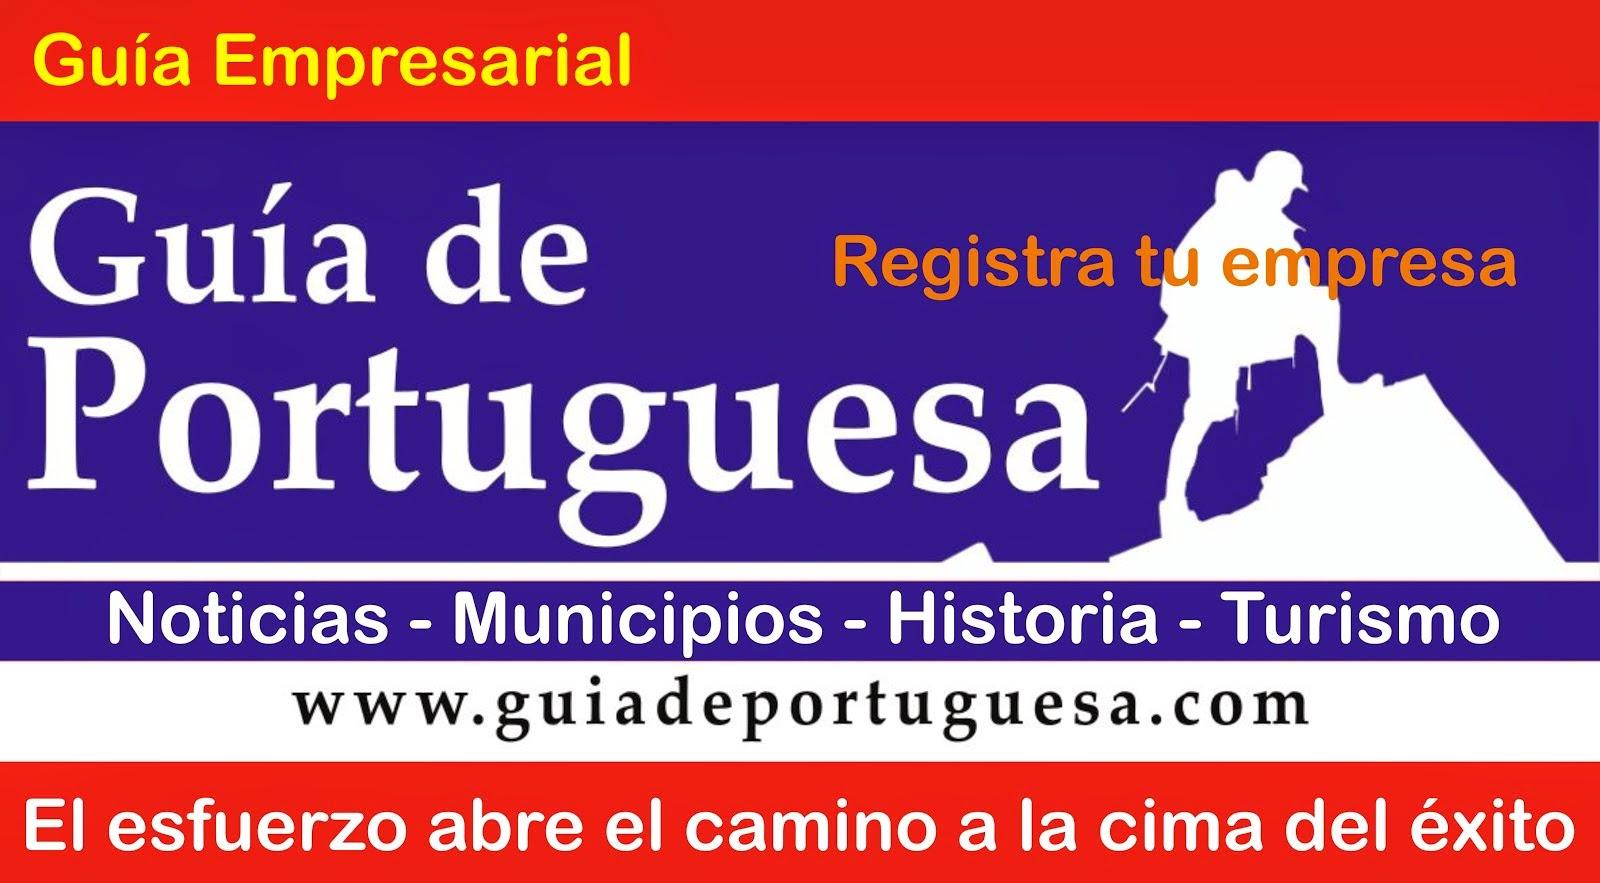 www.Guiadeportuguesa.com